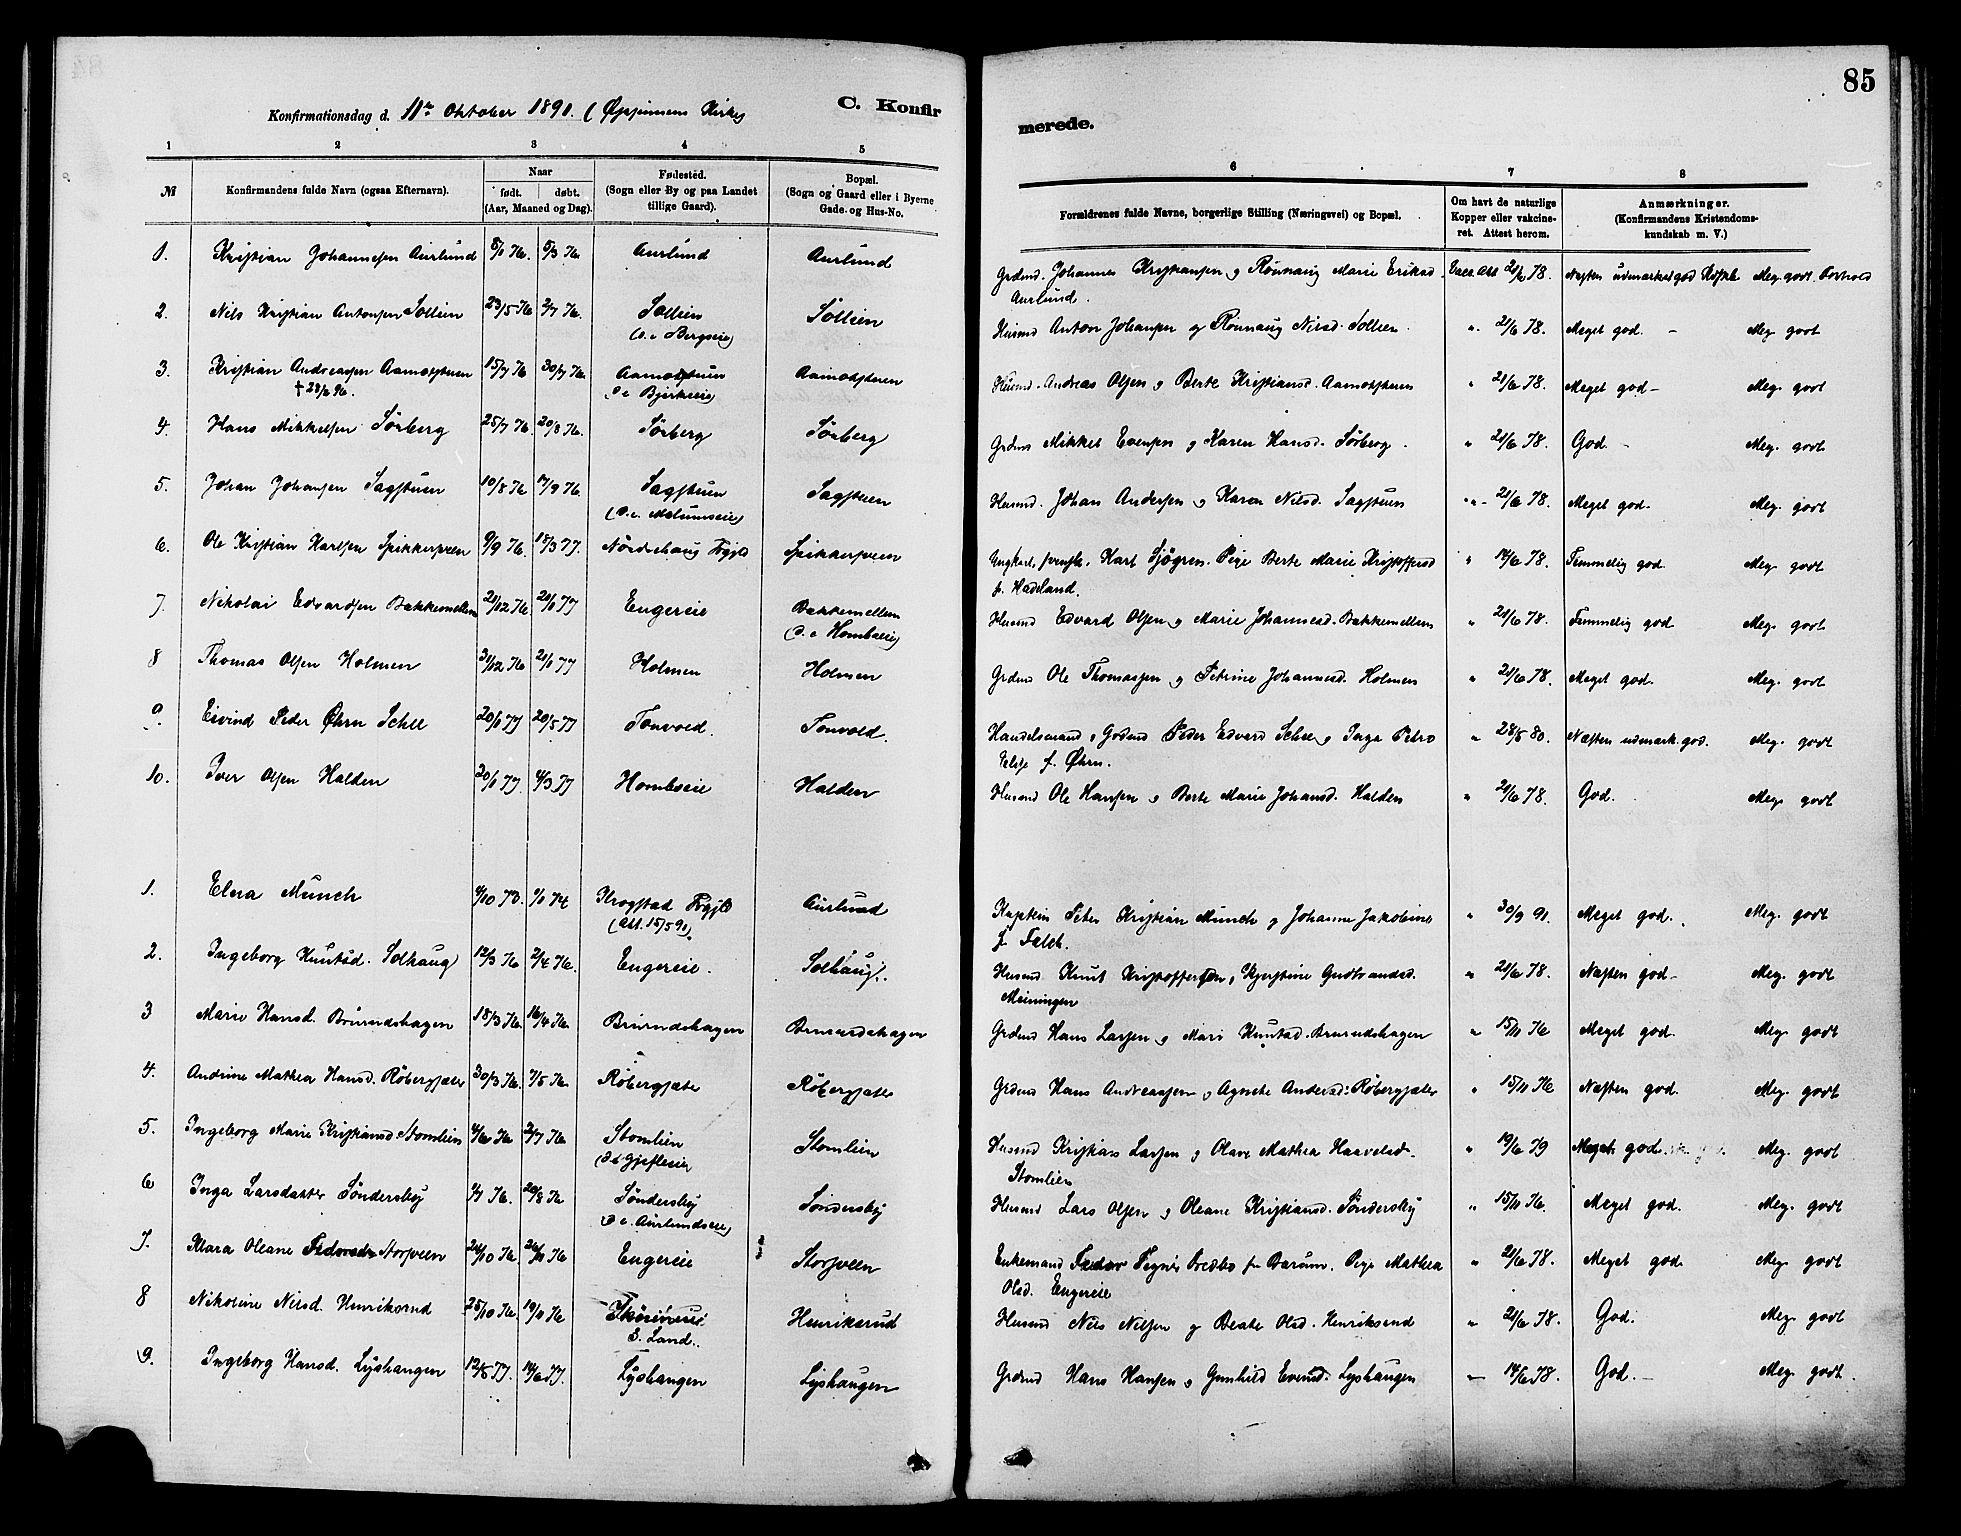 SAH, Nordre Land prestekontor, Ministerialbok nr. 3, 1882-1896, s. 85